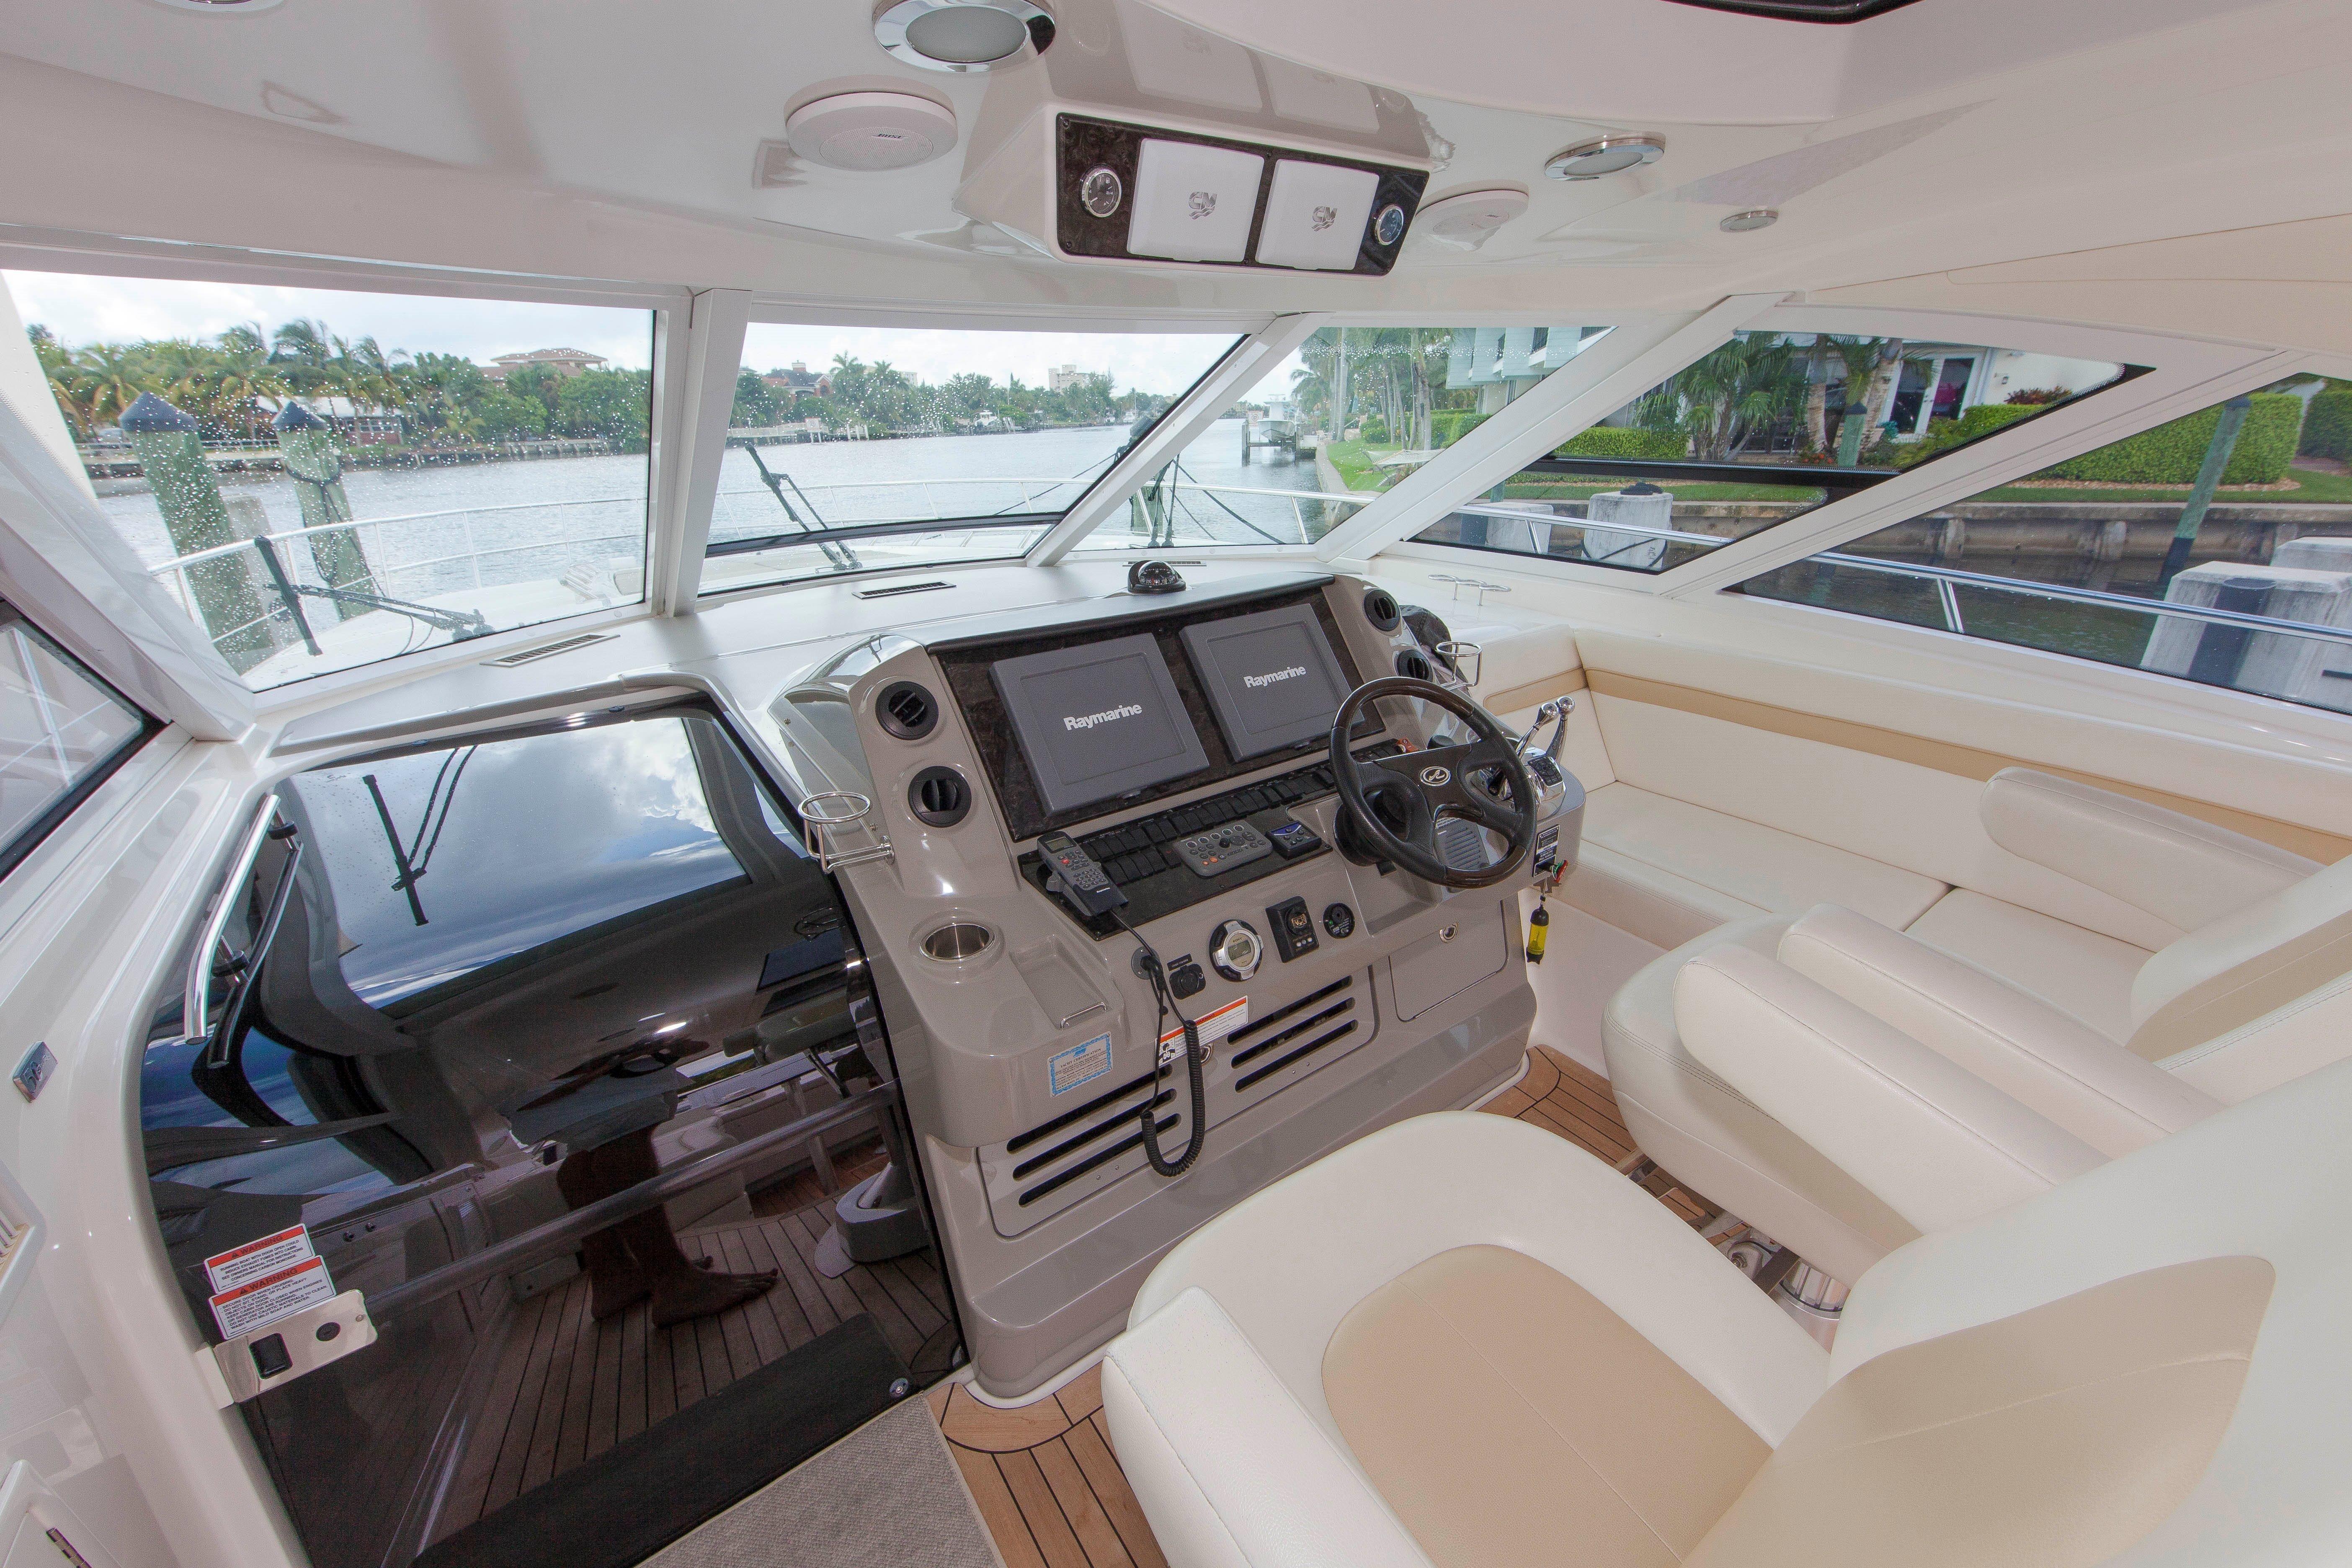 54 Sea Ray Helm Controls